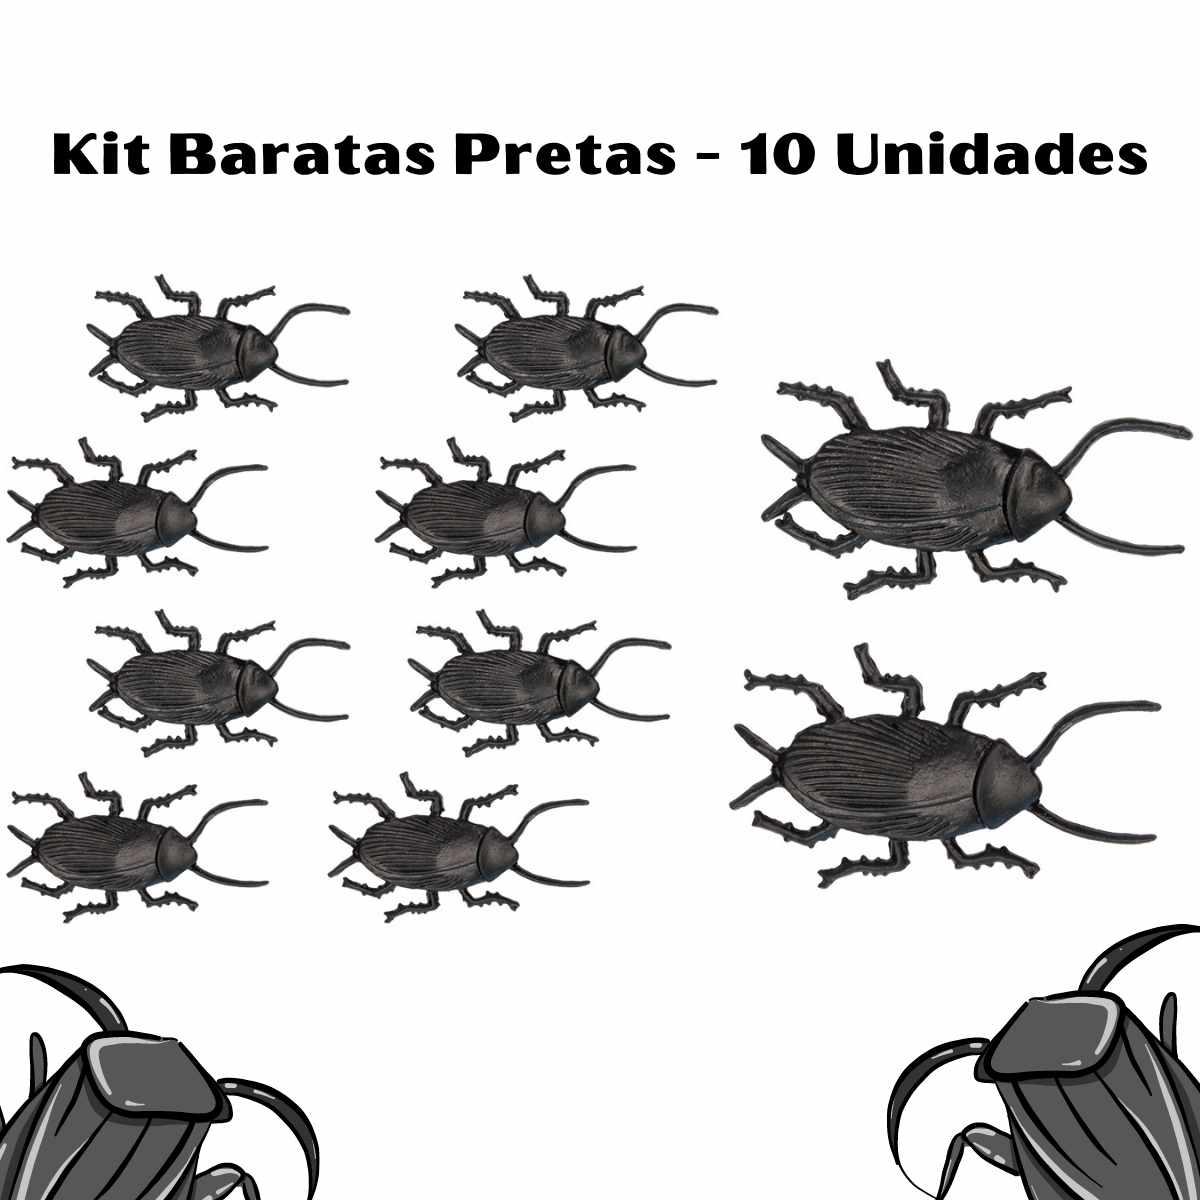 Kit Baratas Pretas com 10